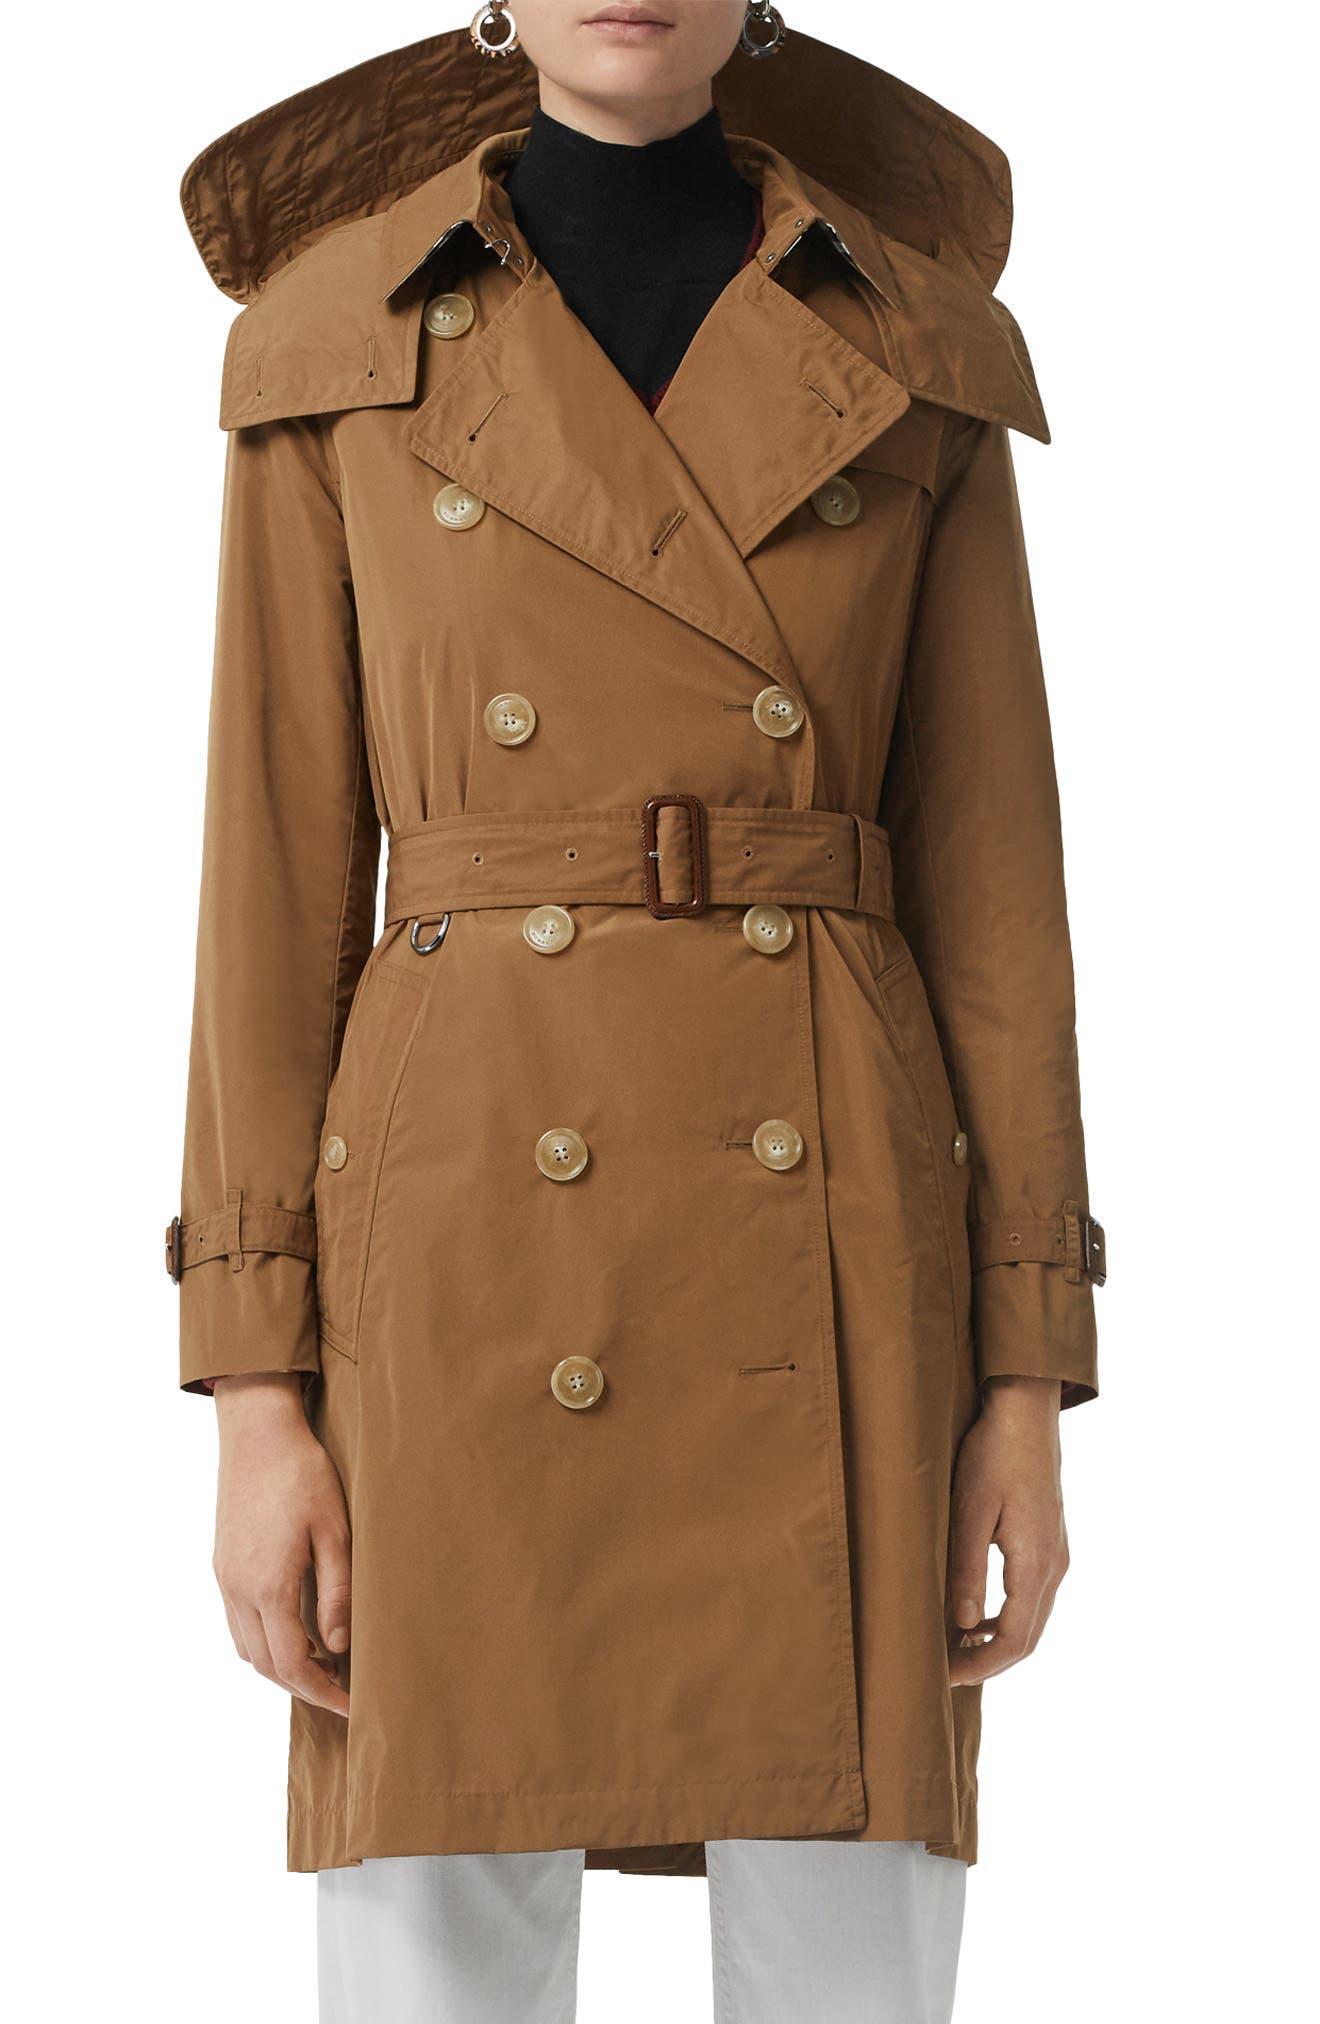 Burberry Kensington Trench Coat with Detachable Hood